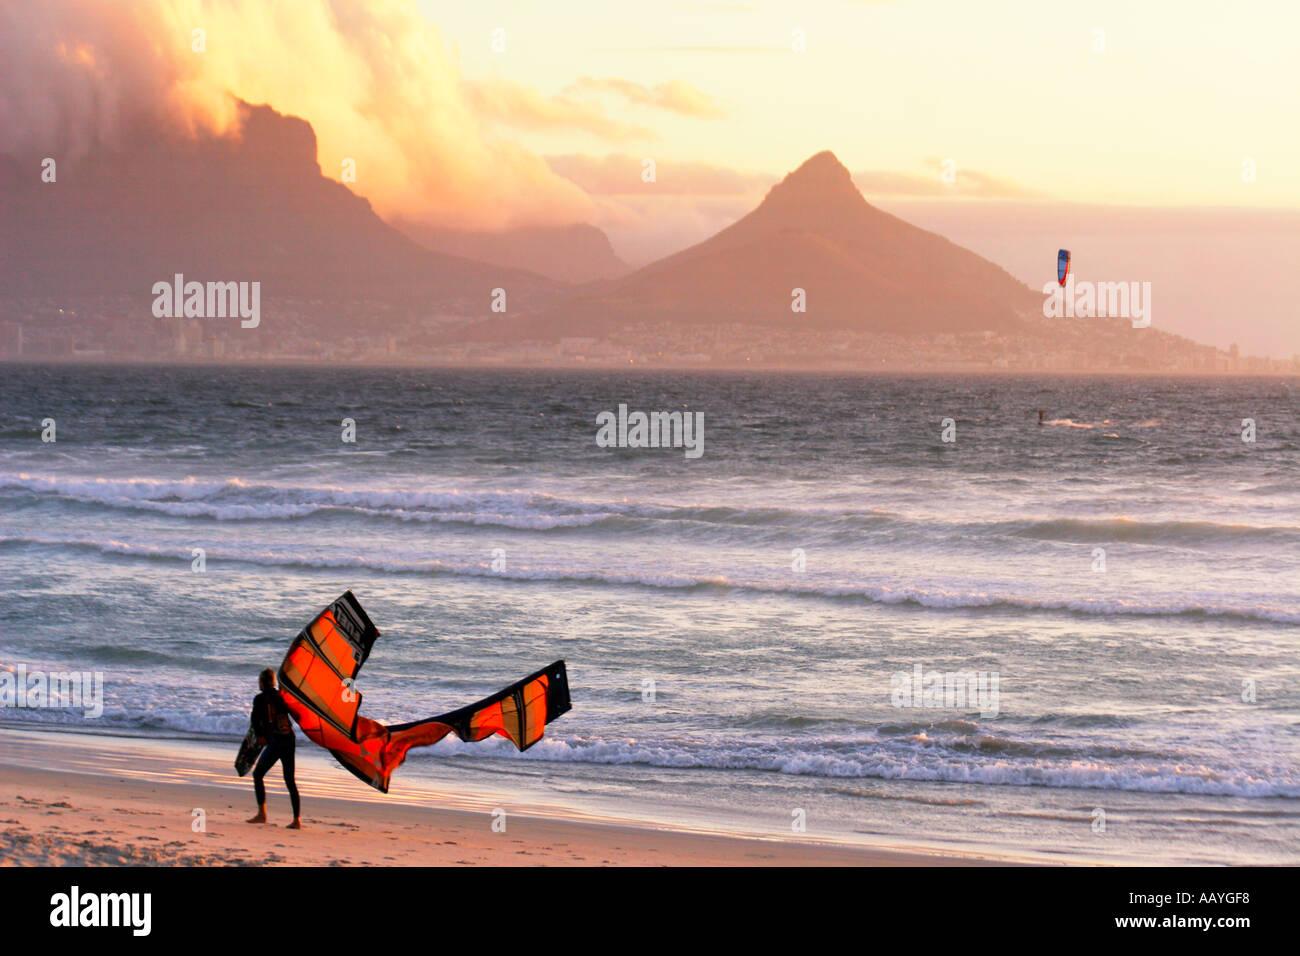 Sudáfrica Ciudad del Cabo blouberg beach table mountain sunset kitesurfer Imagen De Stock